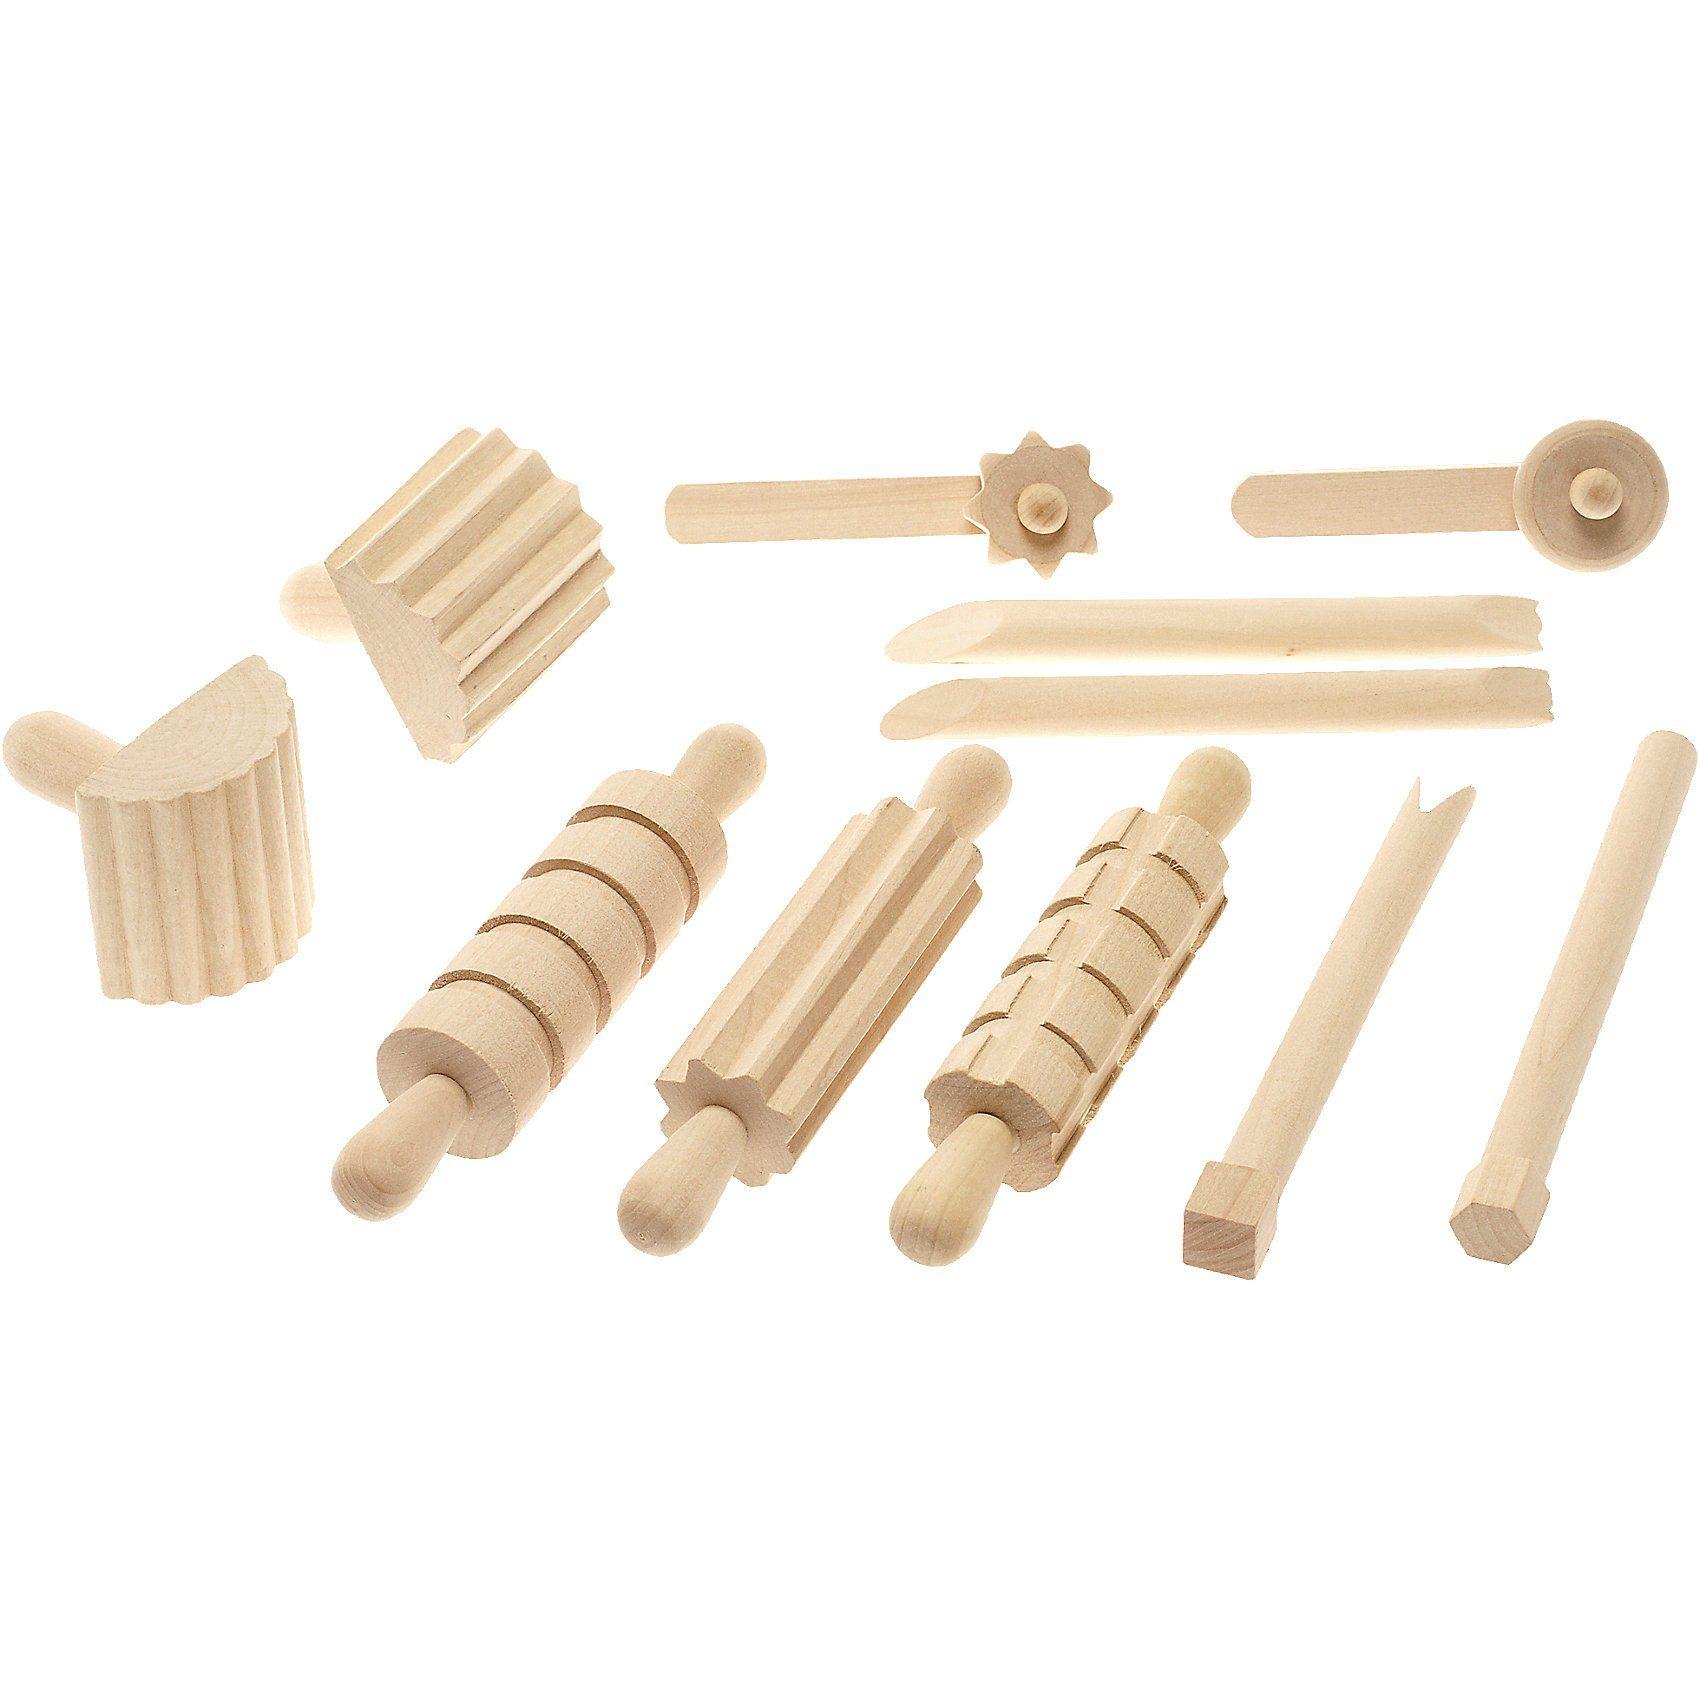 SUNNYSUE Modellierwerkzeuge aus Holz, 11-tlg.